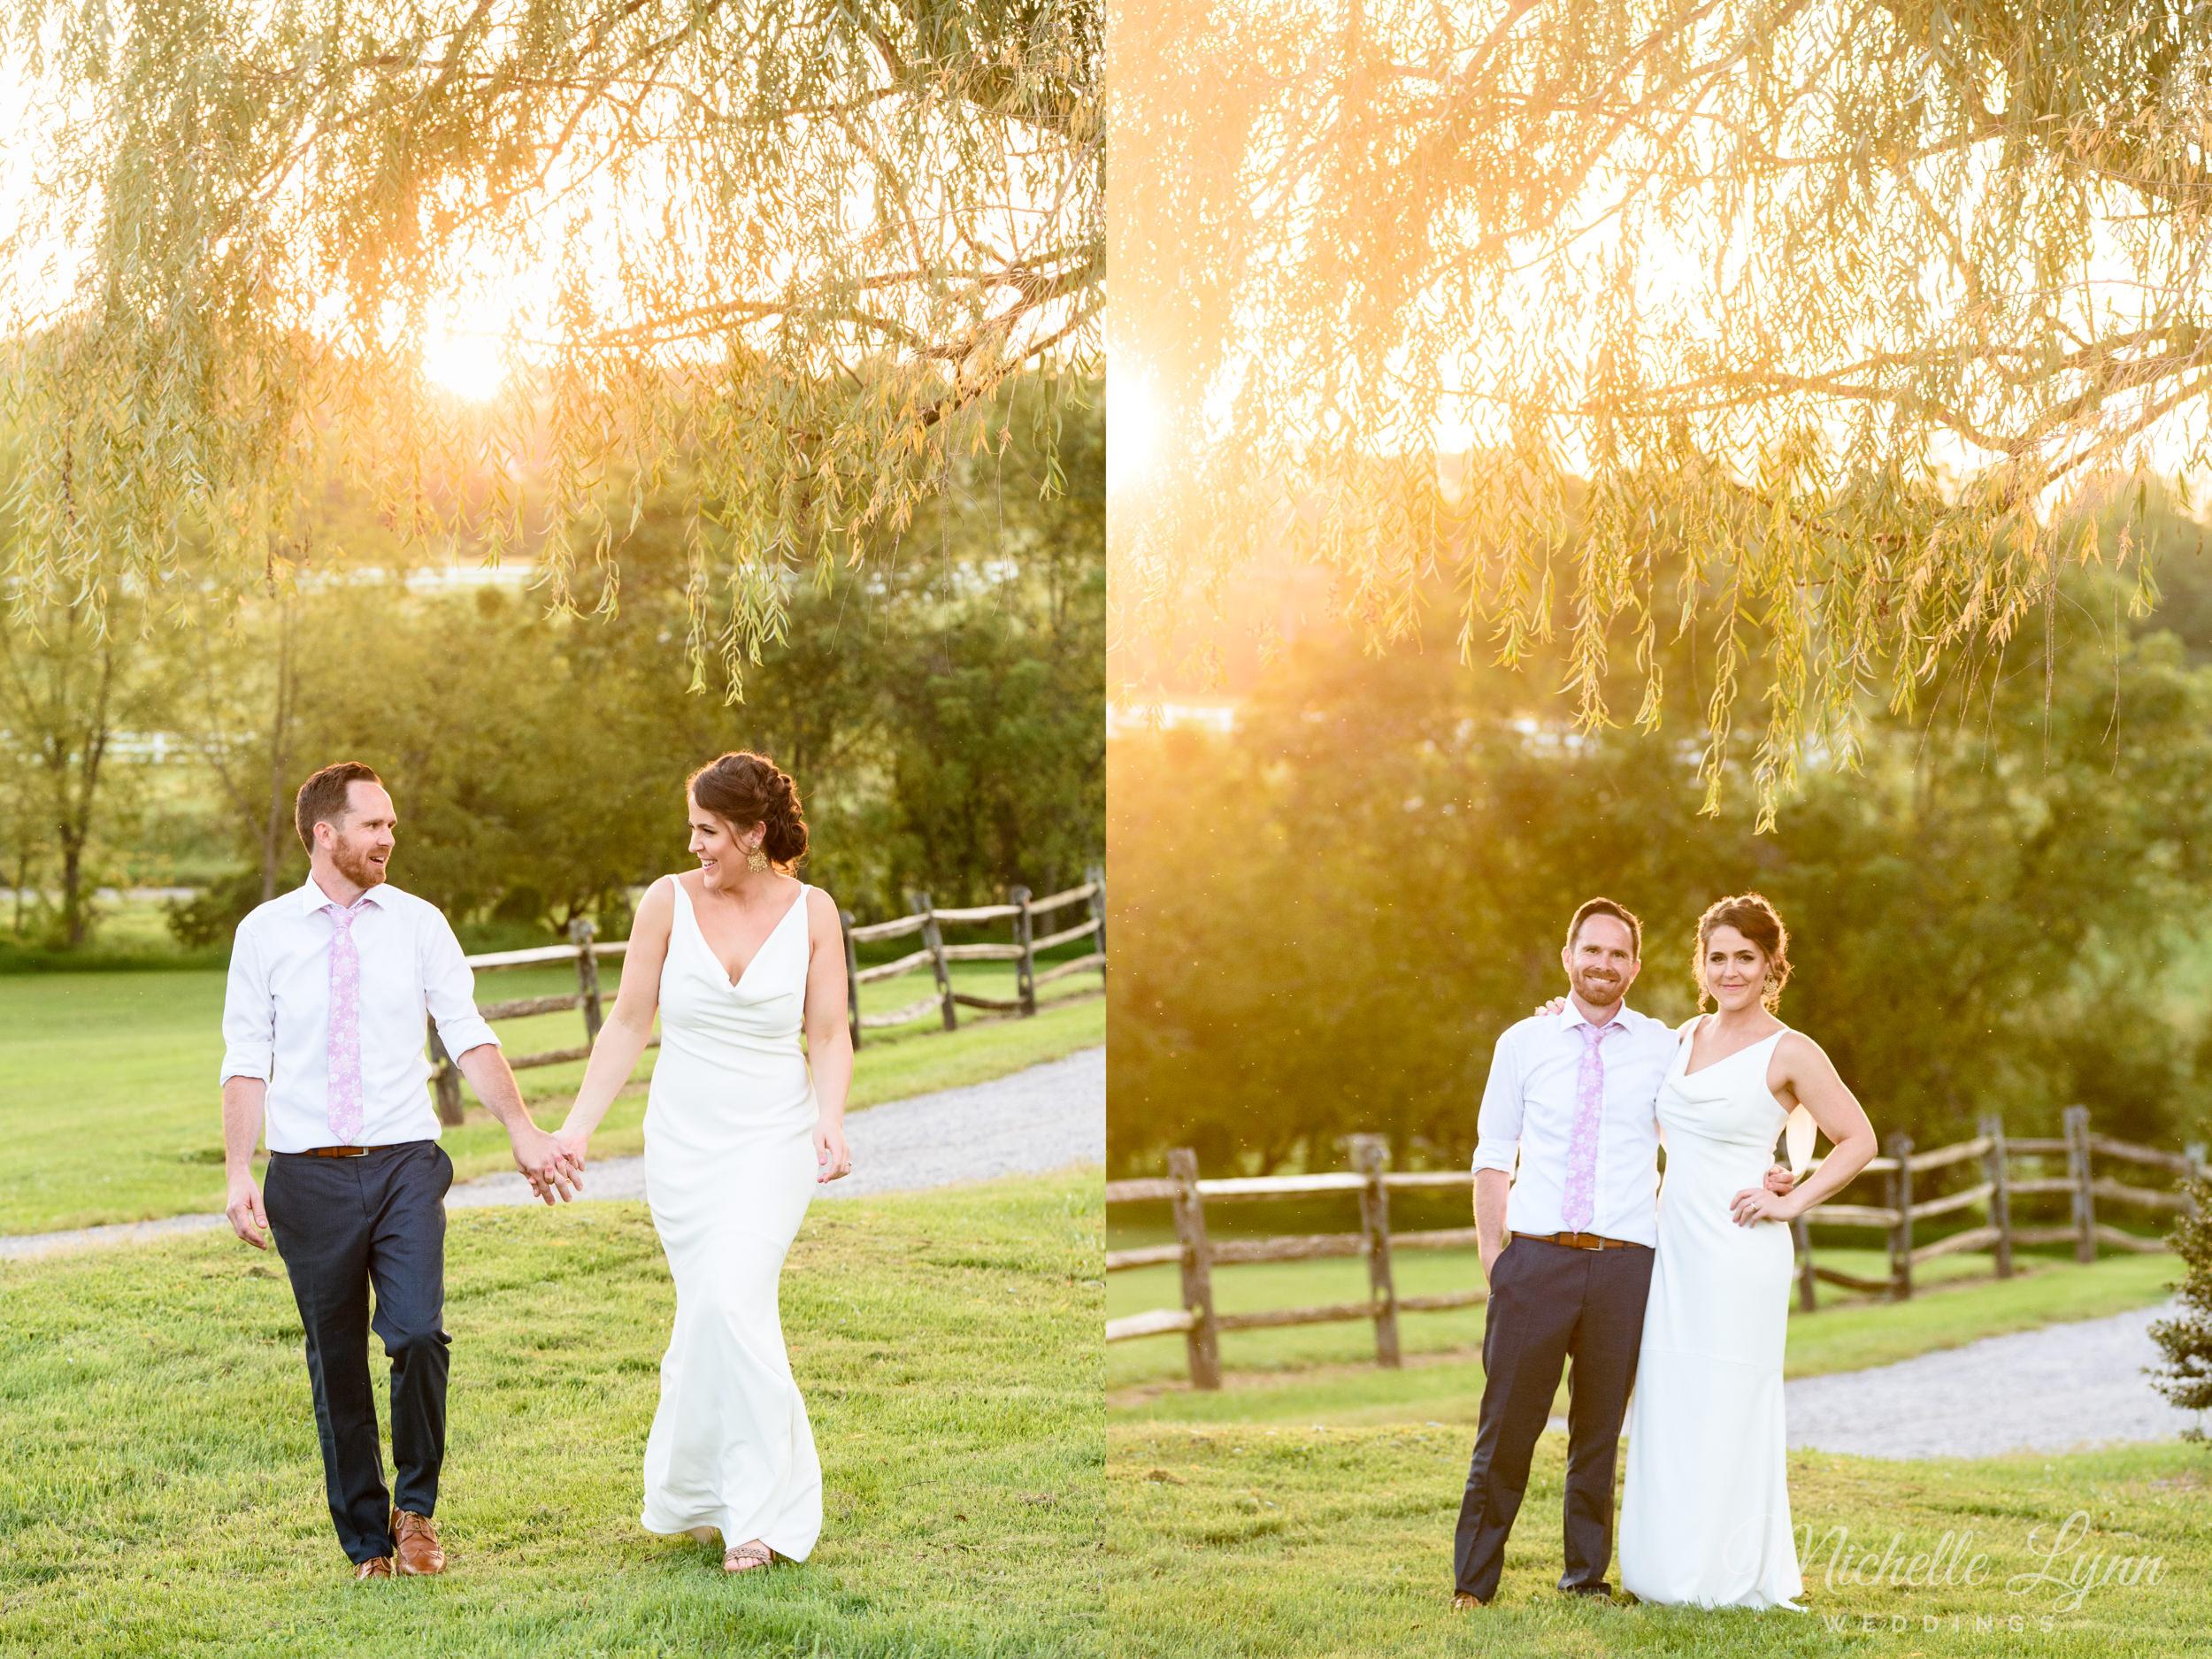 mlw-unionville-vineyards-nj-wedding-photography-91.jpg